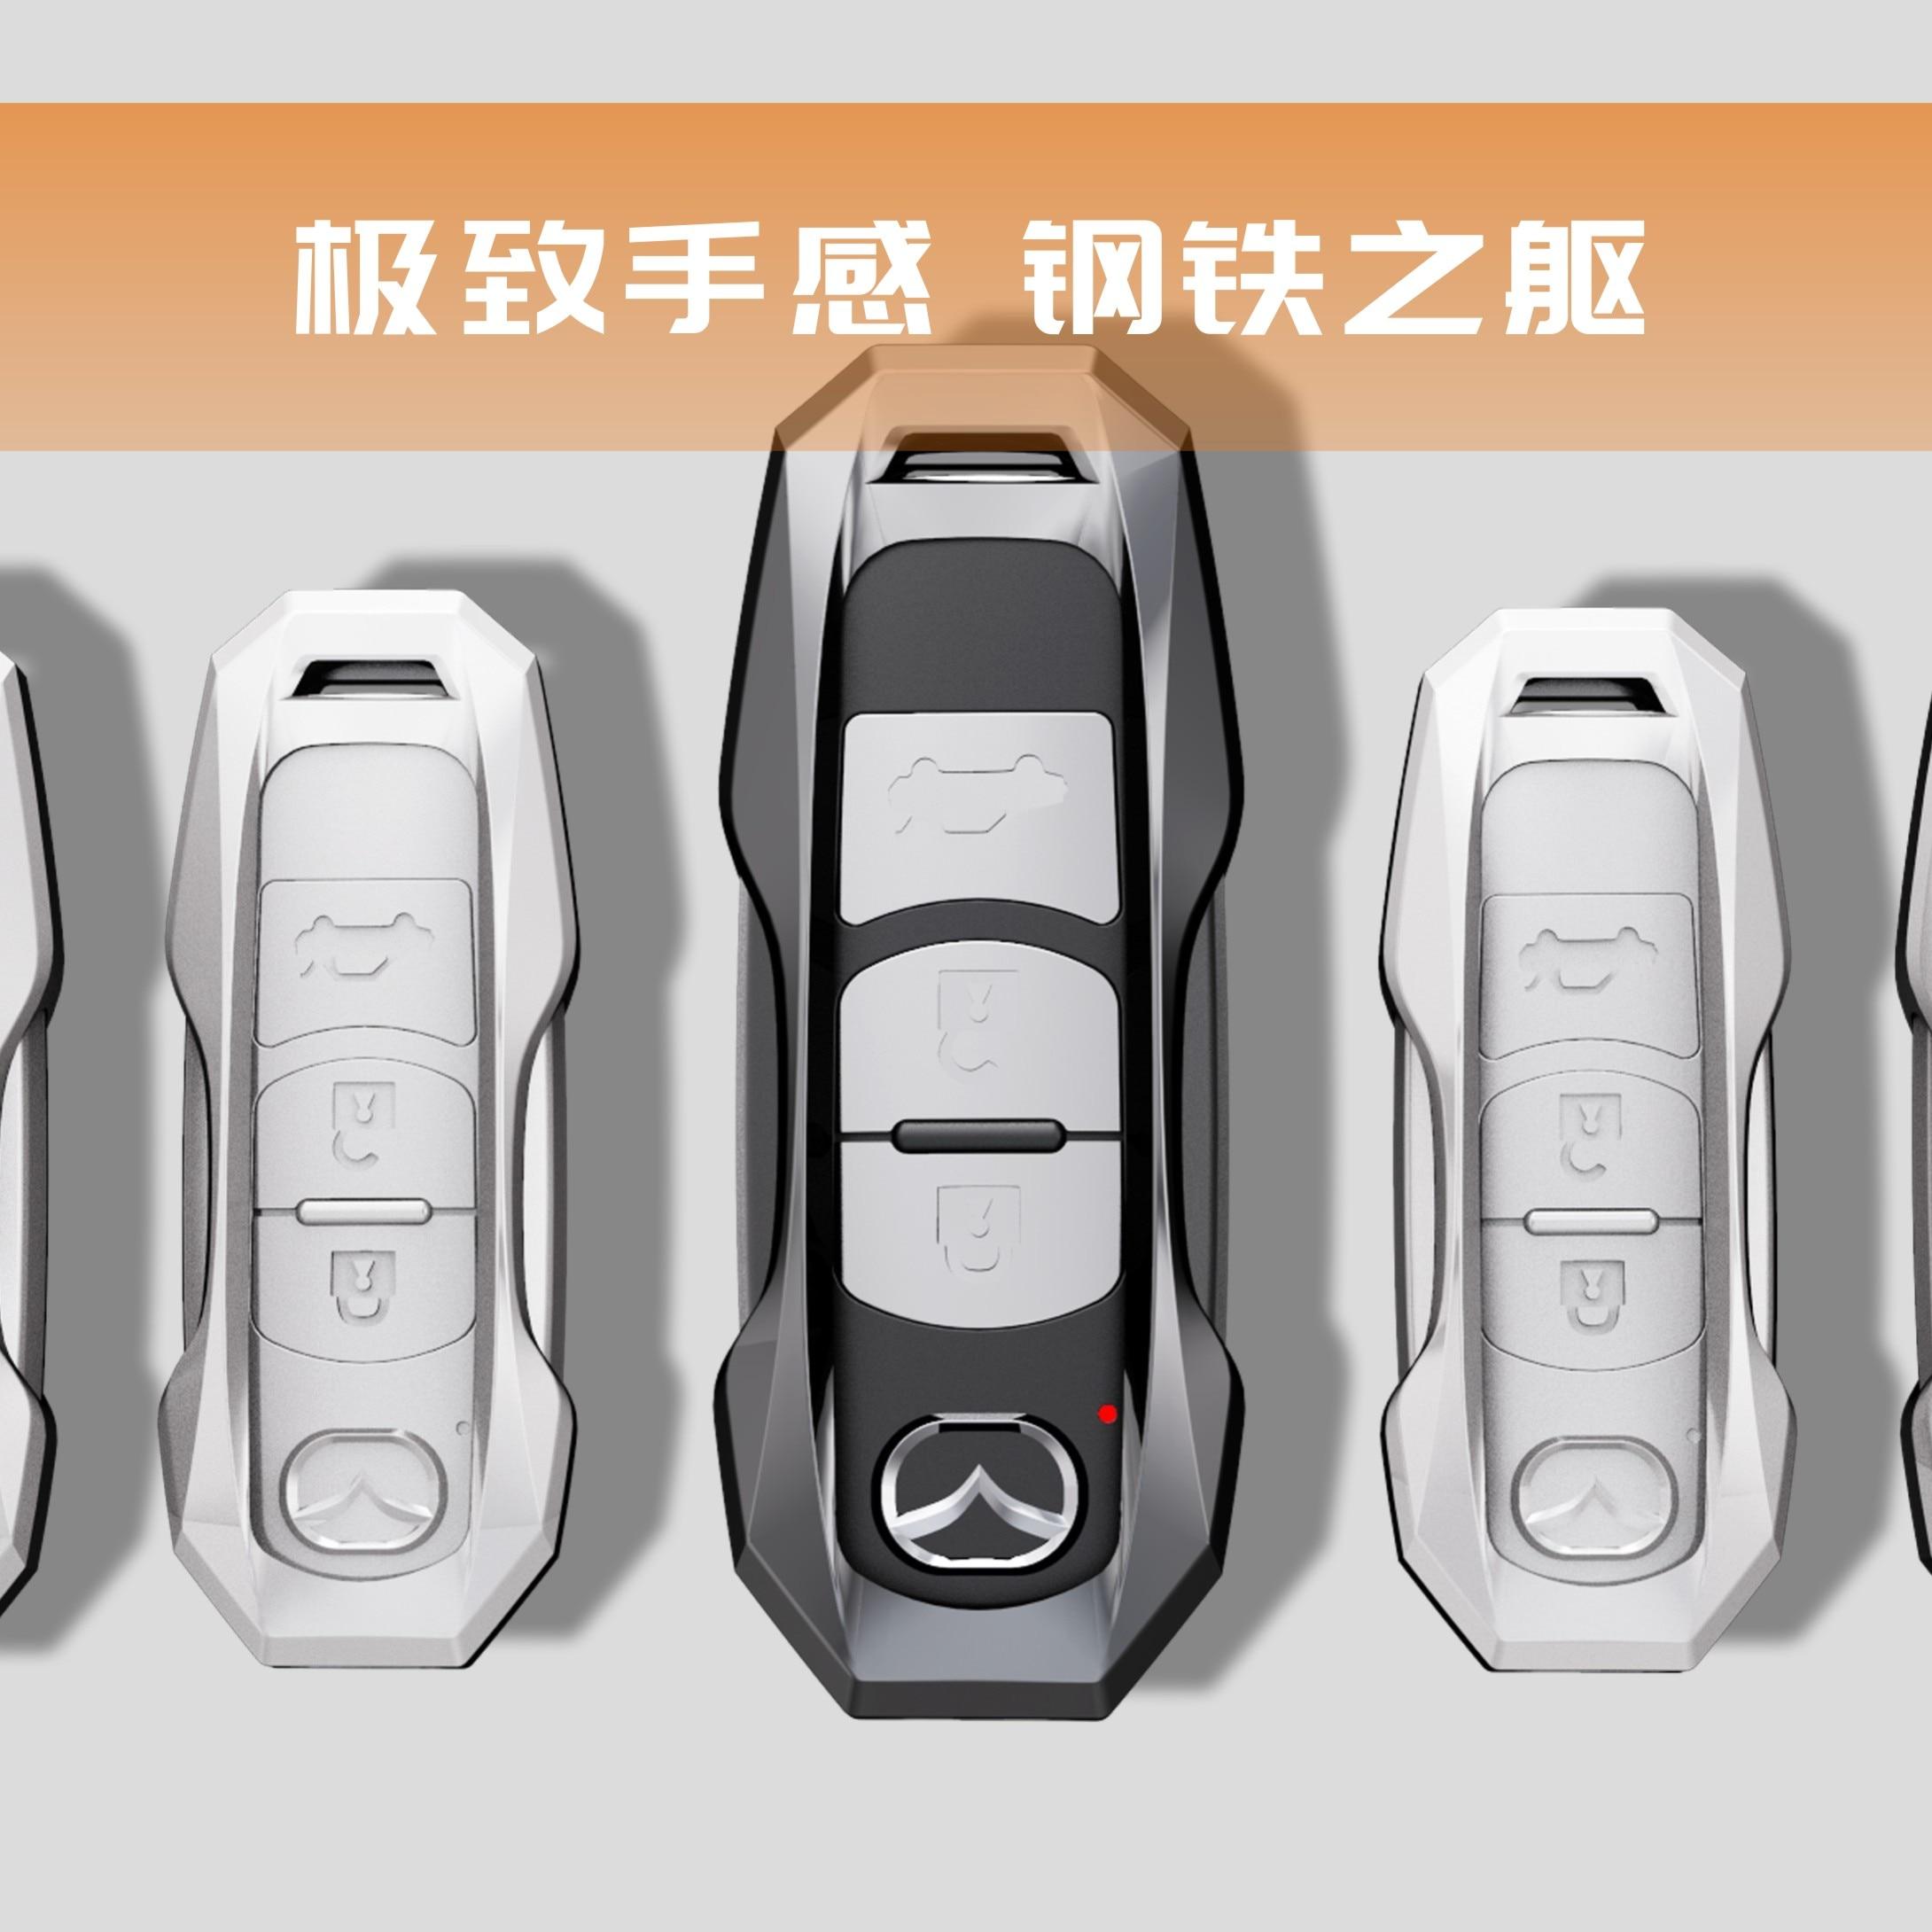 New Metal Car Key Cover Case Fit For Mazda 2 3 5 6 2017 CX-4 CX-5 CX-7 CX-9 CX-3 CX 5 Accessories